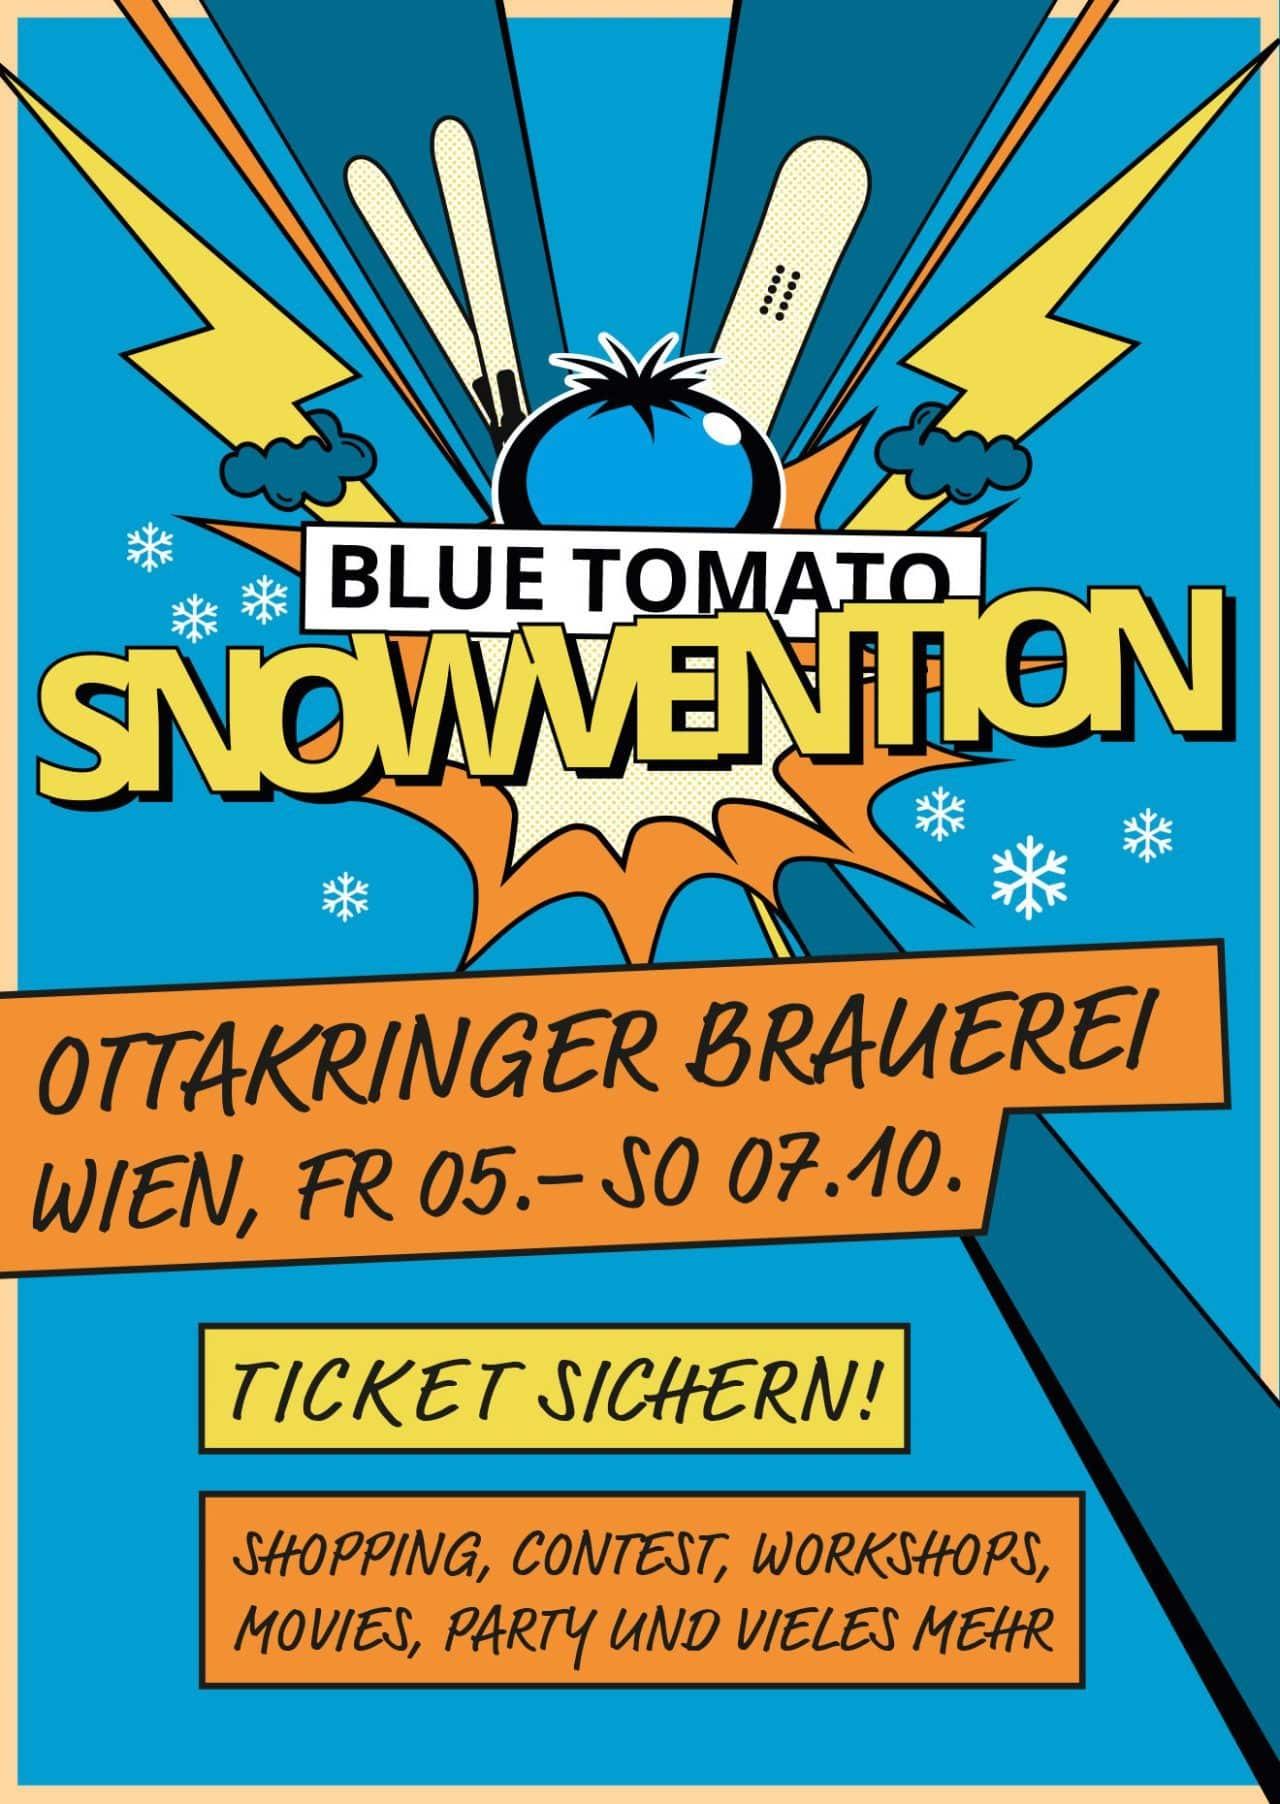 Blue Tomato Snowvention Wien